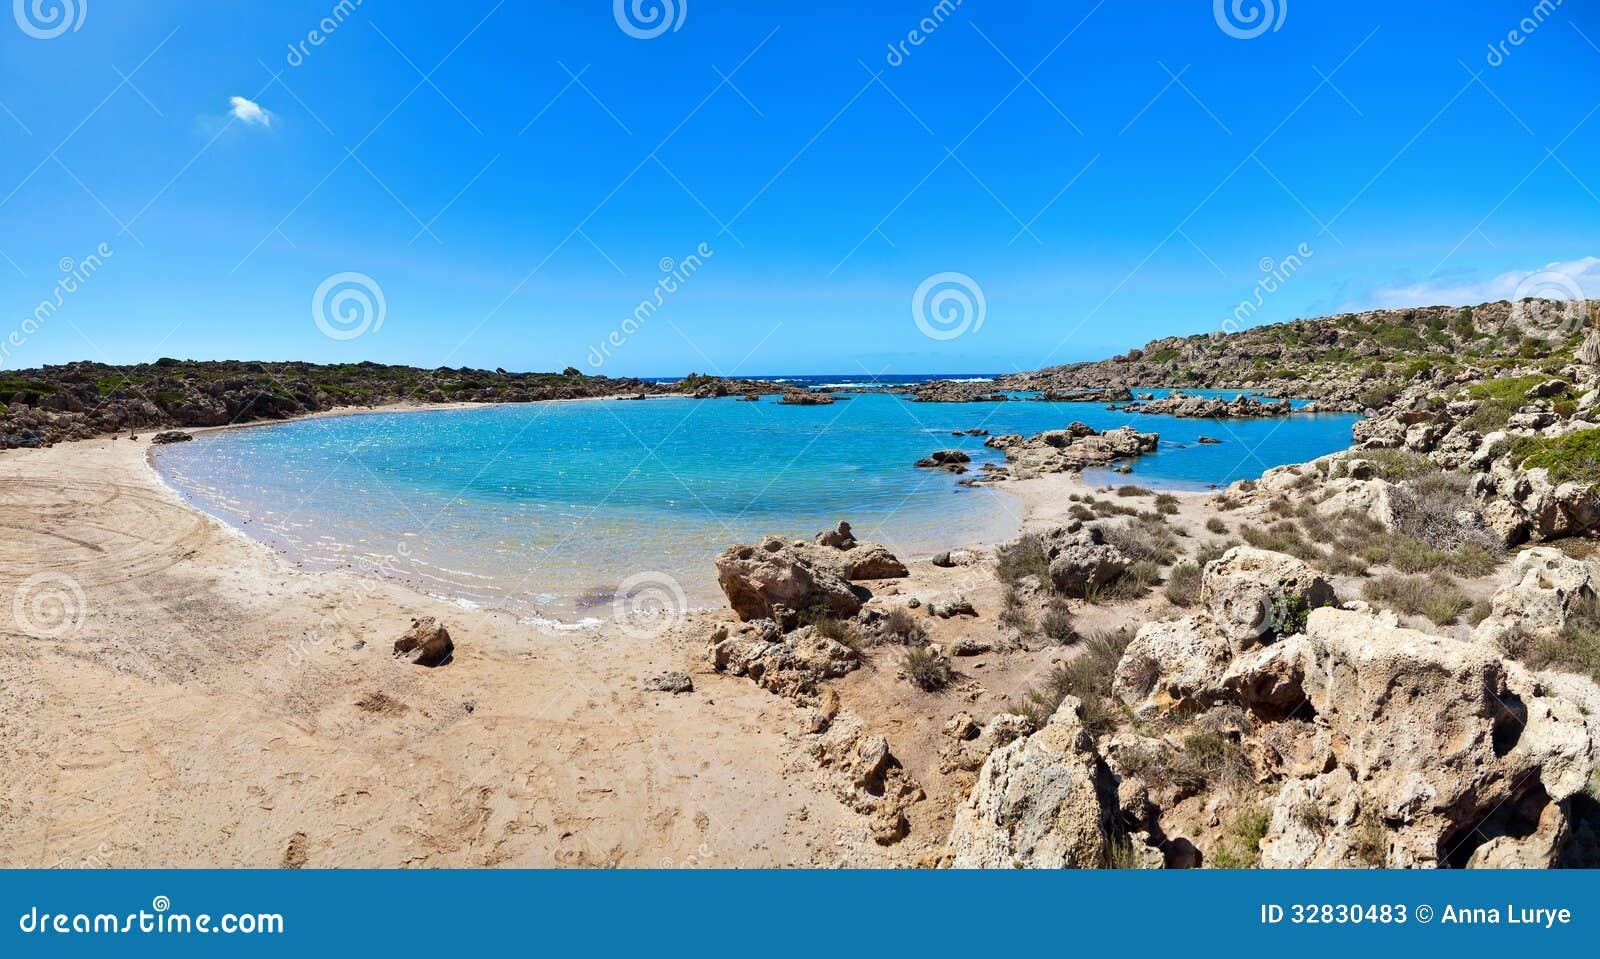 Beautiful sunny day with blue sky at Aspri Limni in Crete, Greece.